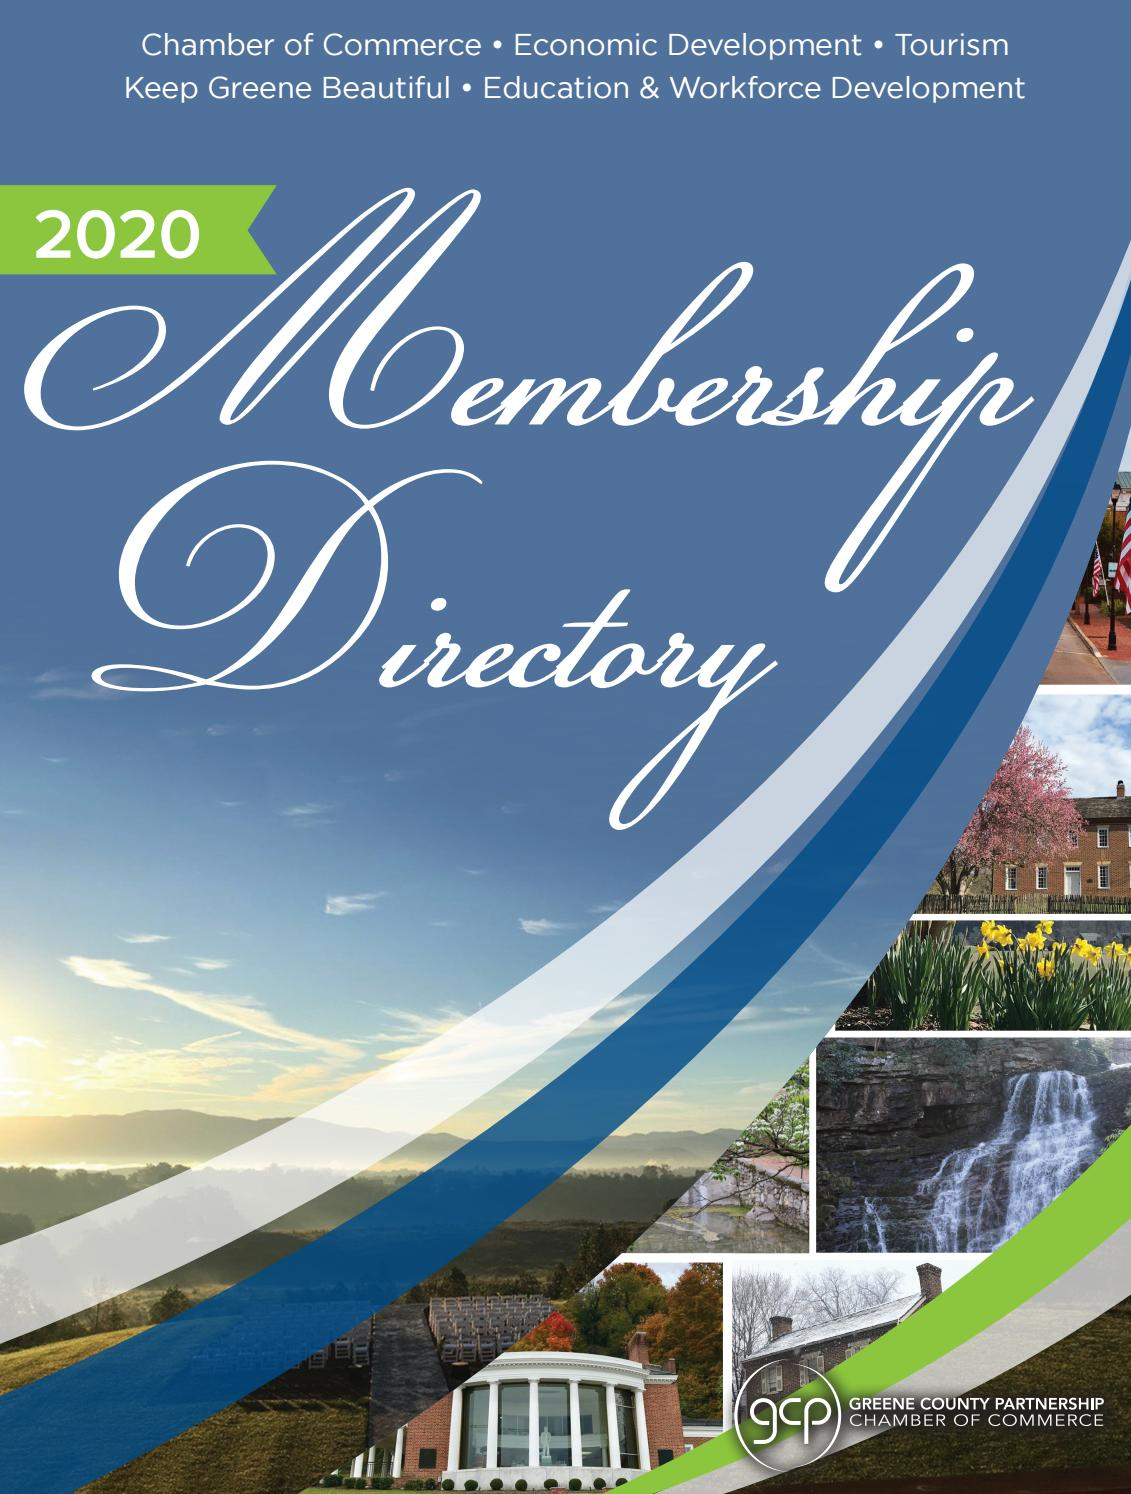 Harry Greeneville Tn Halloween 2020 Greene County Partnership Directory 2020 by The Greeneville Sun